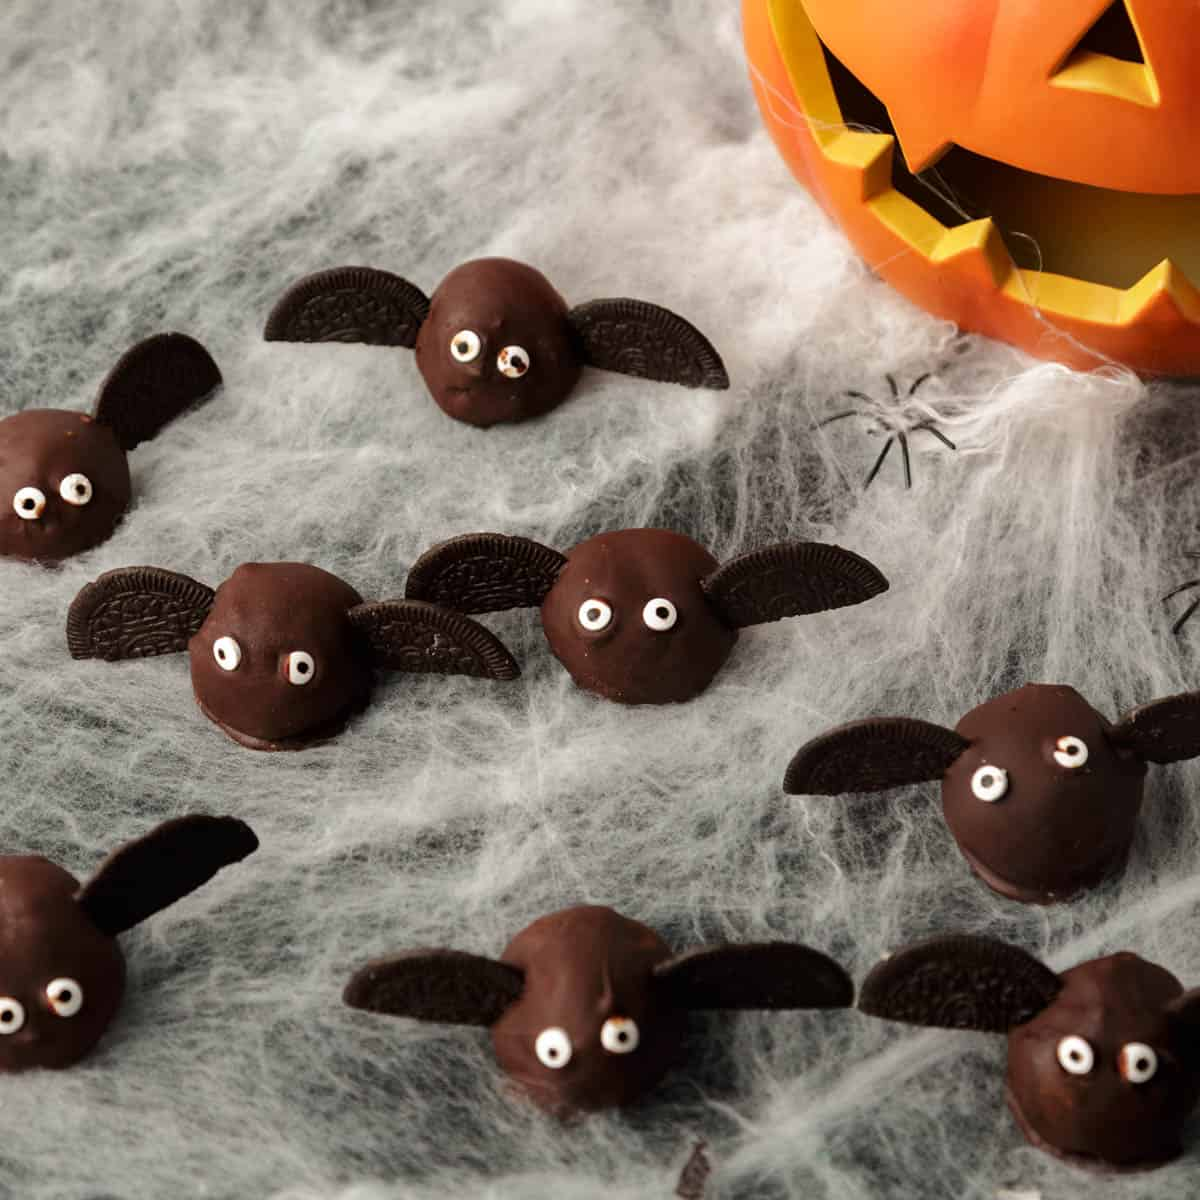 Oreo truffles decorated as bats